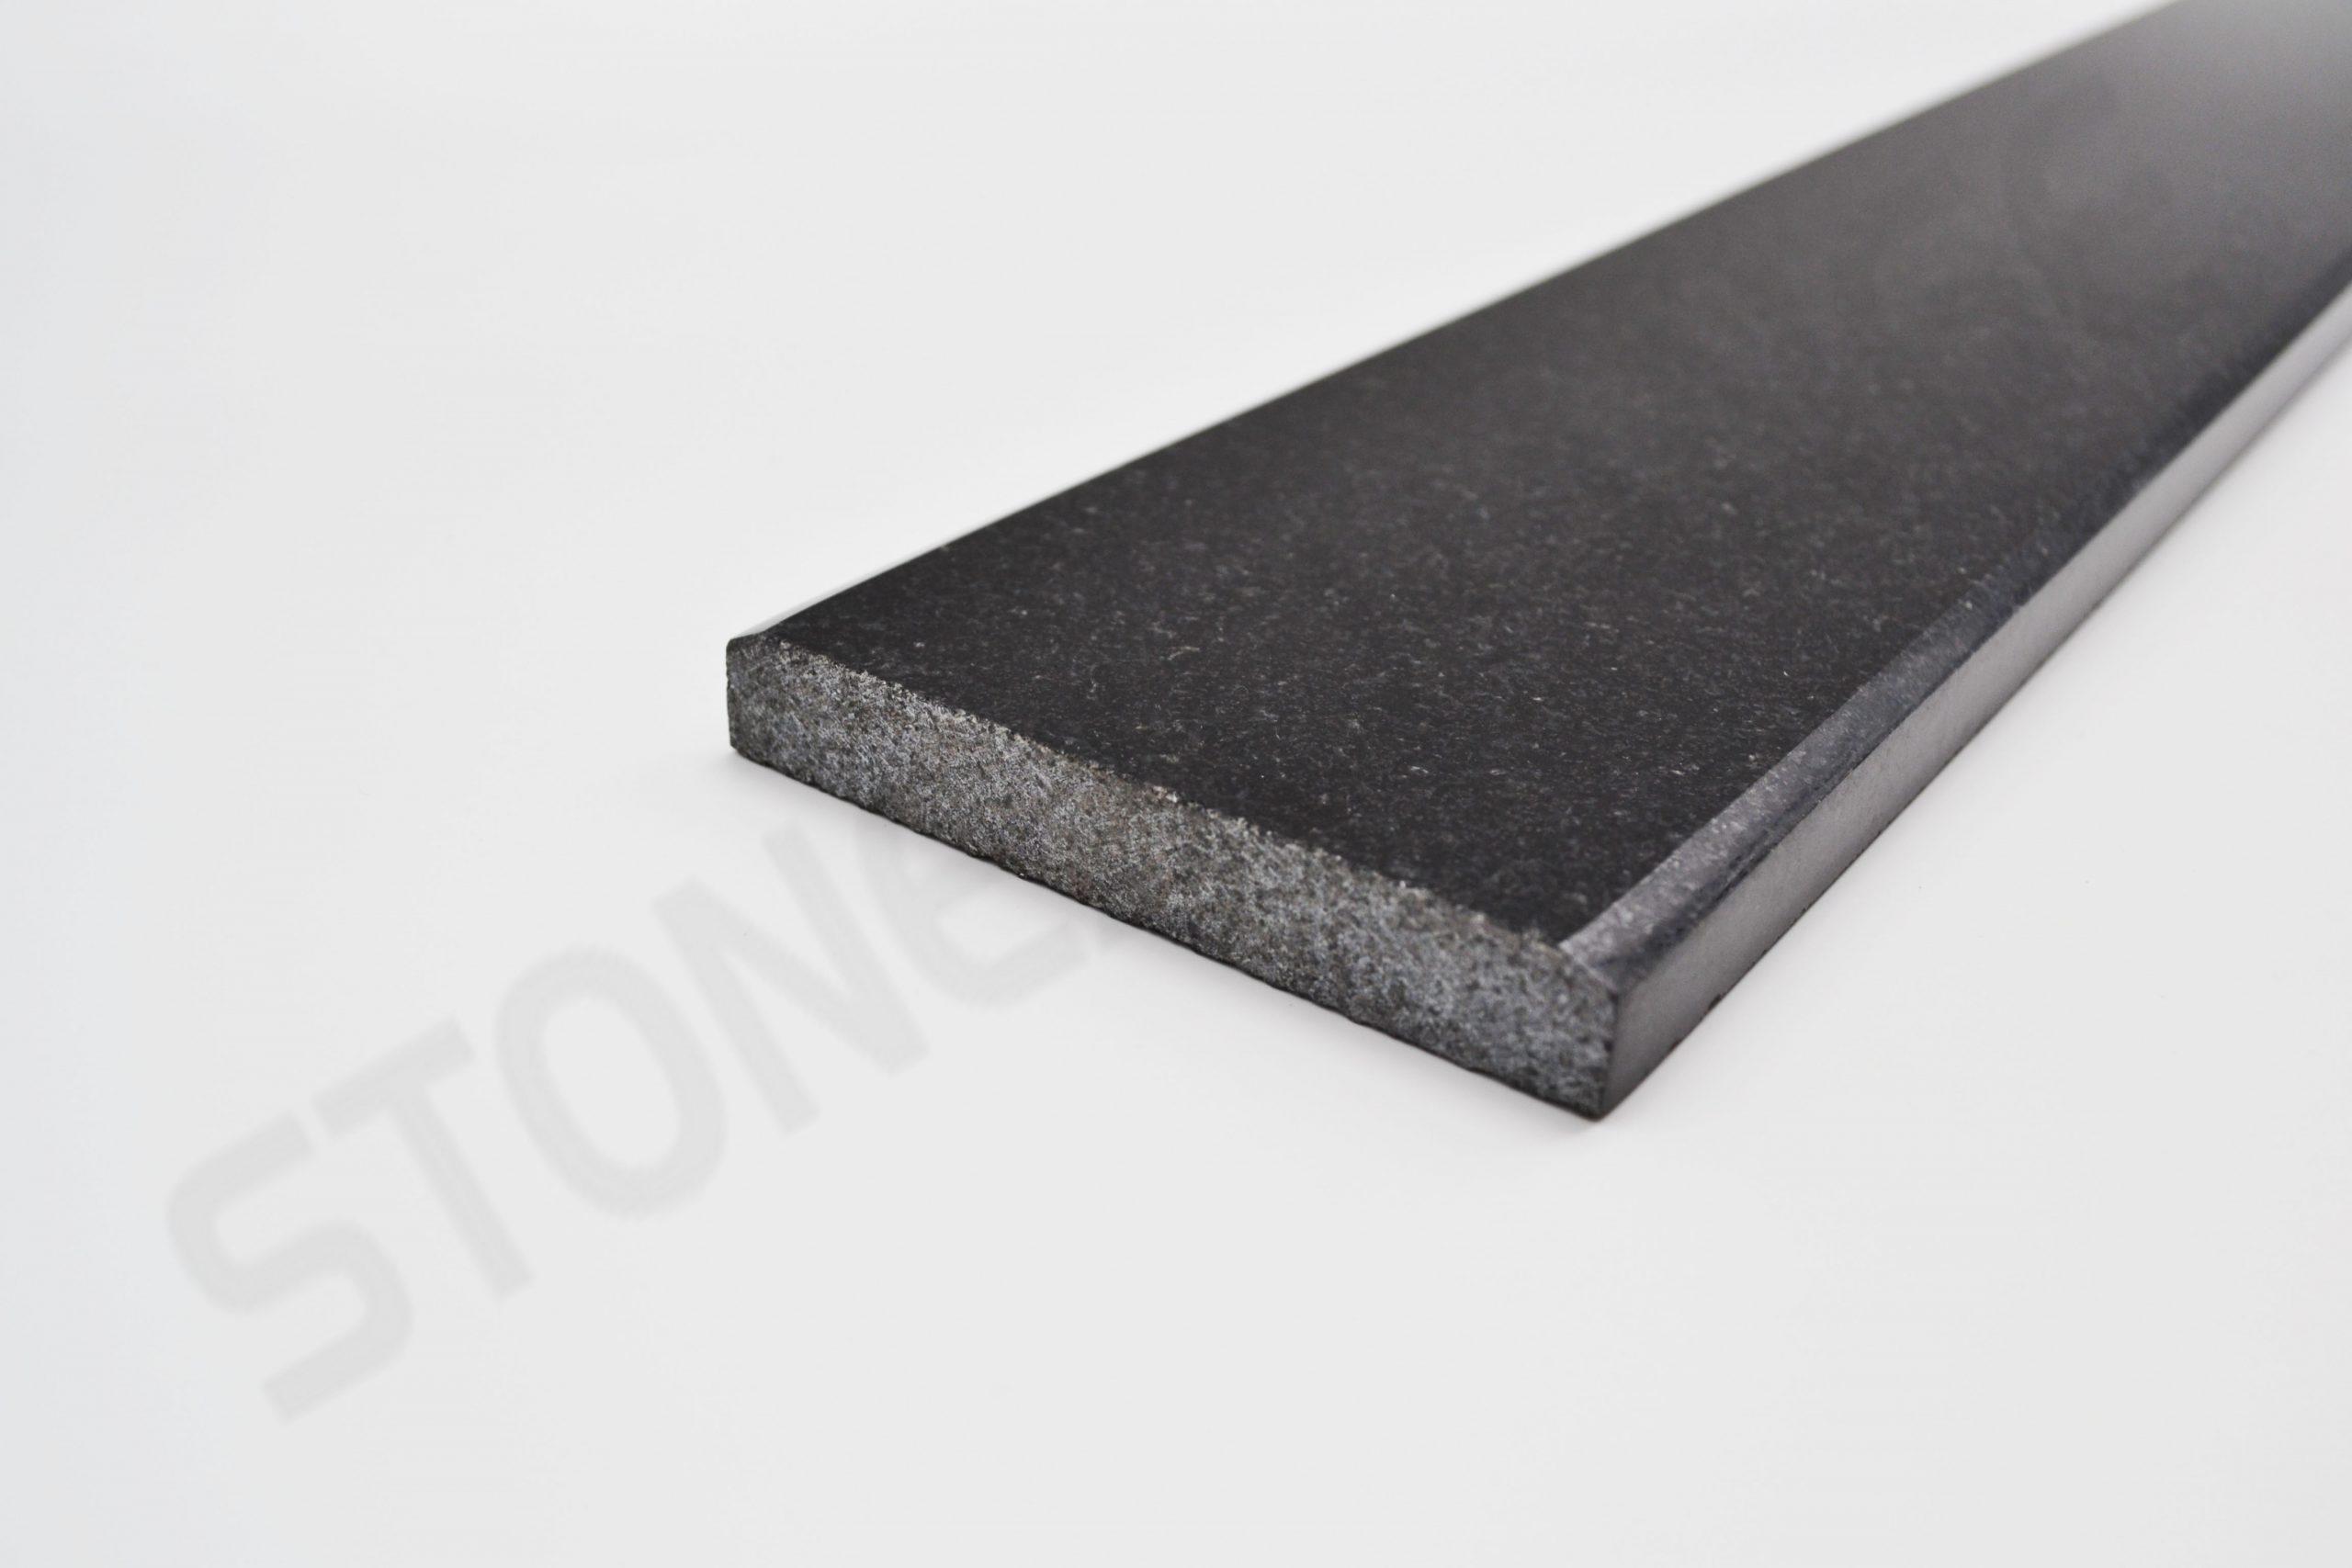 Absolute Black Standard Bevel Thresholds 4x36